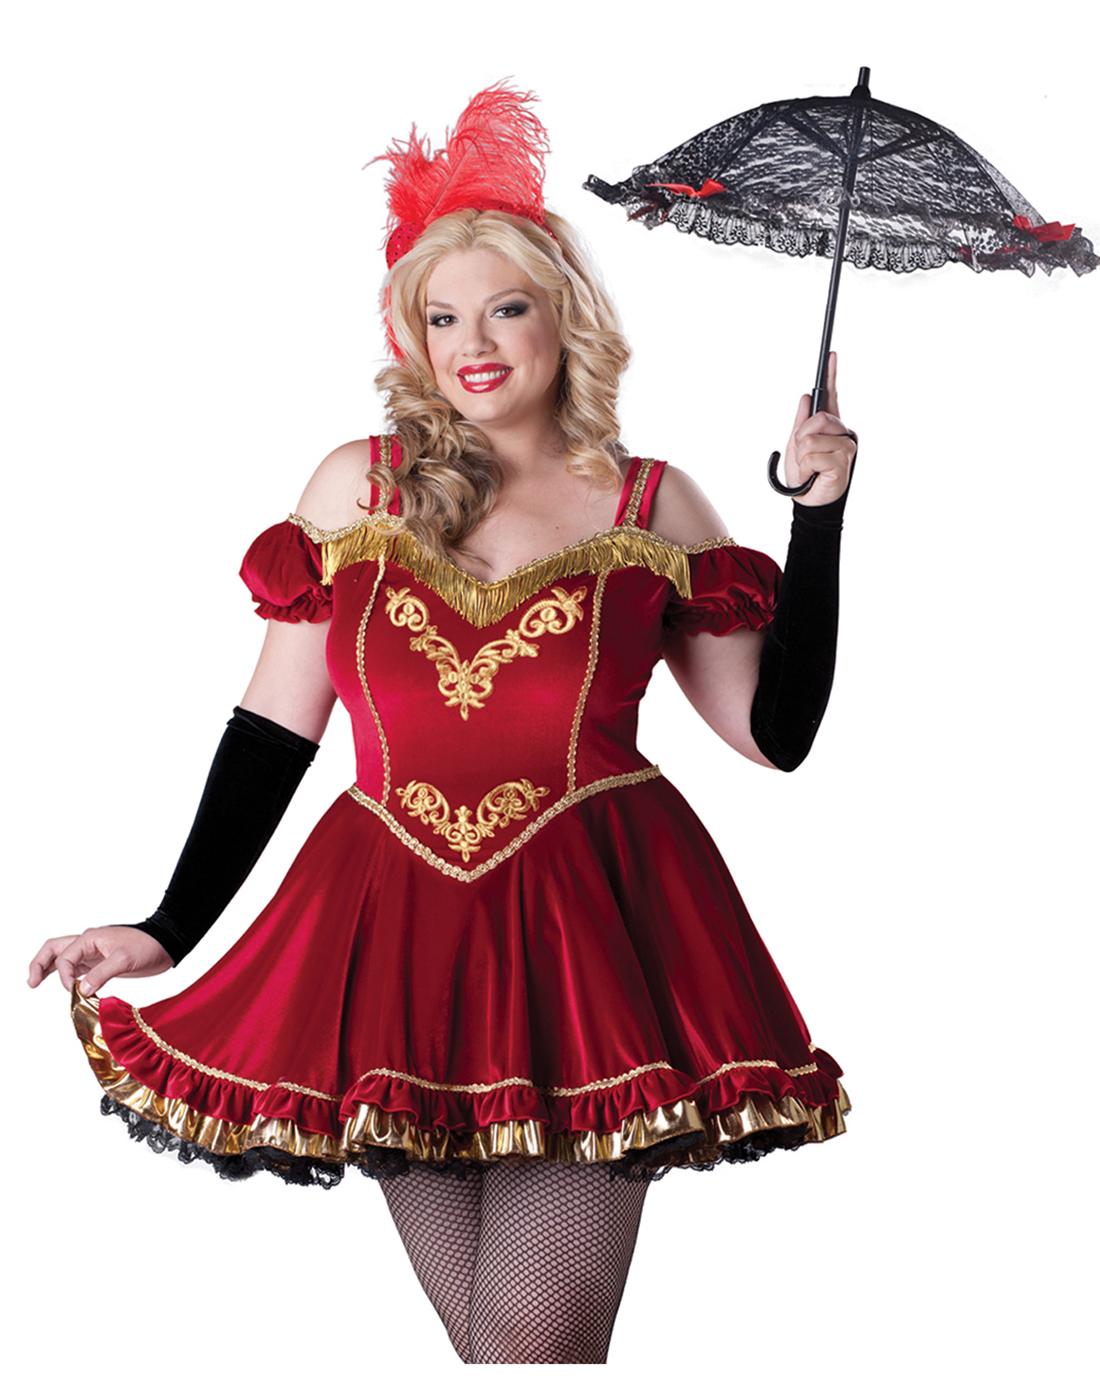 Circus Cutie Clown Jester Costume  sc 1 st  eBay & Circus Cutie Ringmaster Sexy Plus Size Burlesque Fancy Halloween ...